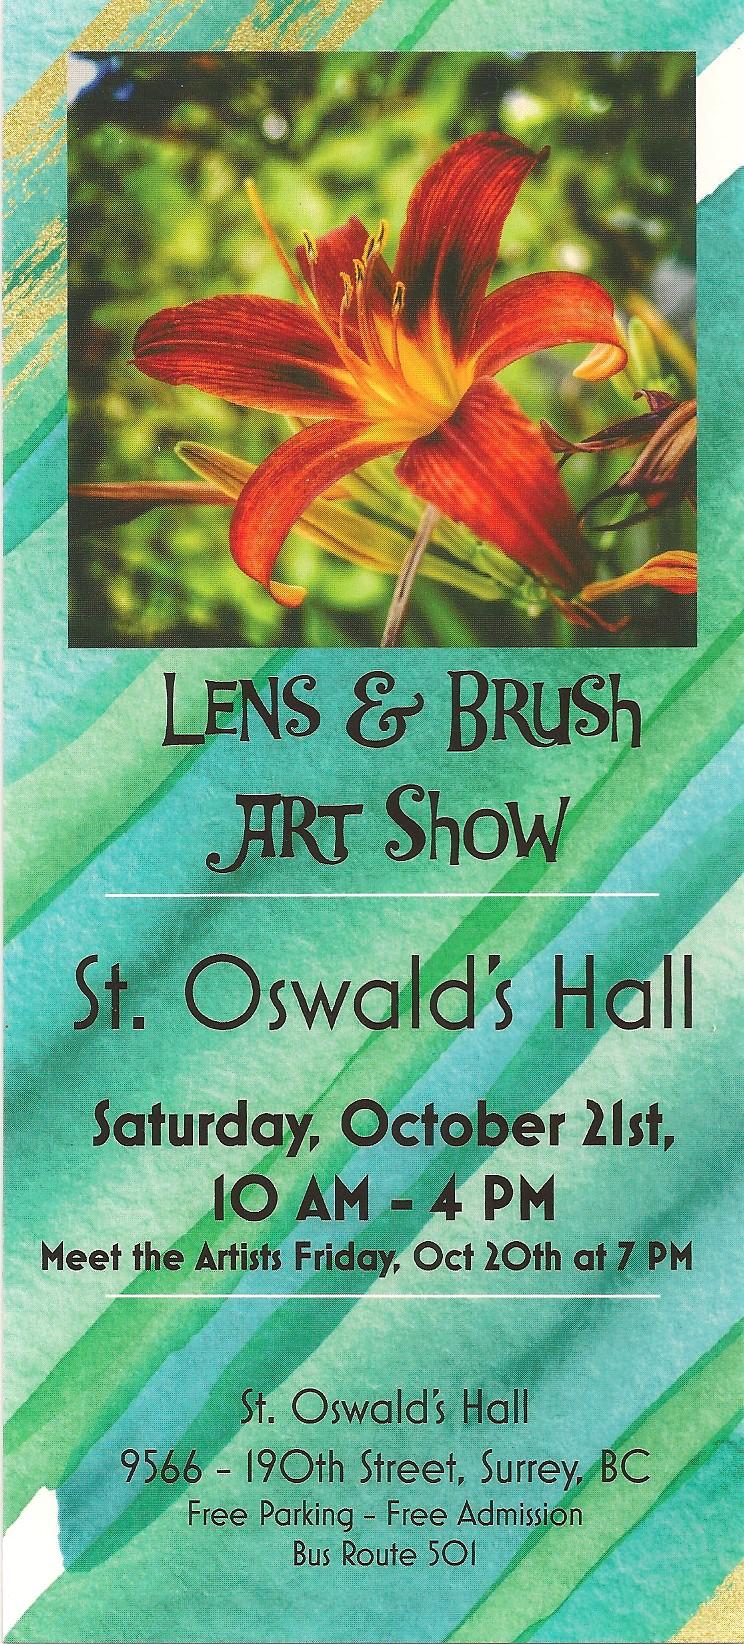 lens and brush art show